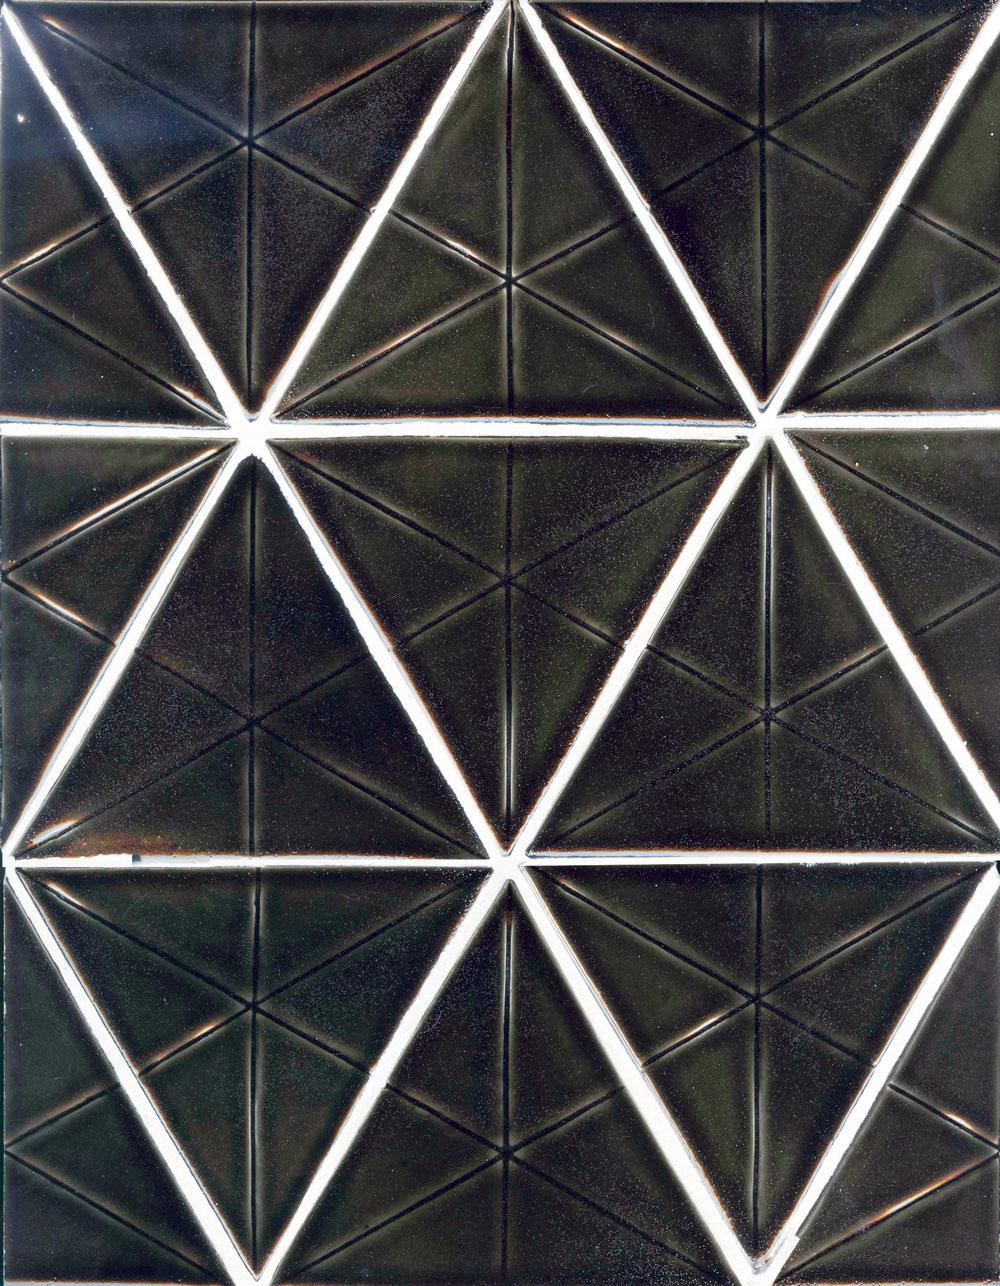 92--Tri-Constelation_WEB.jpg